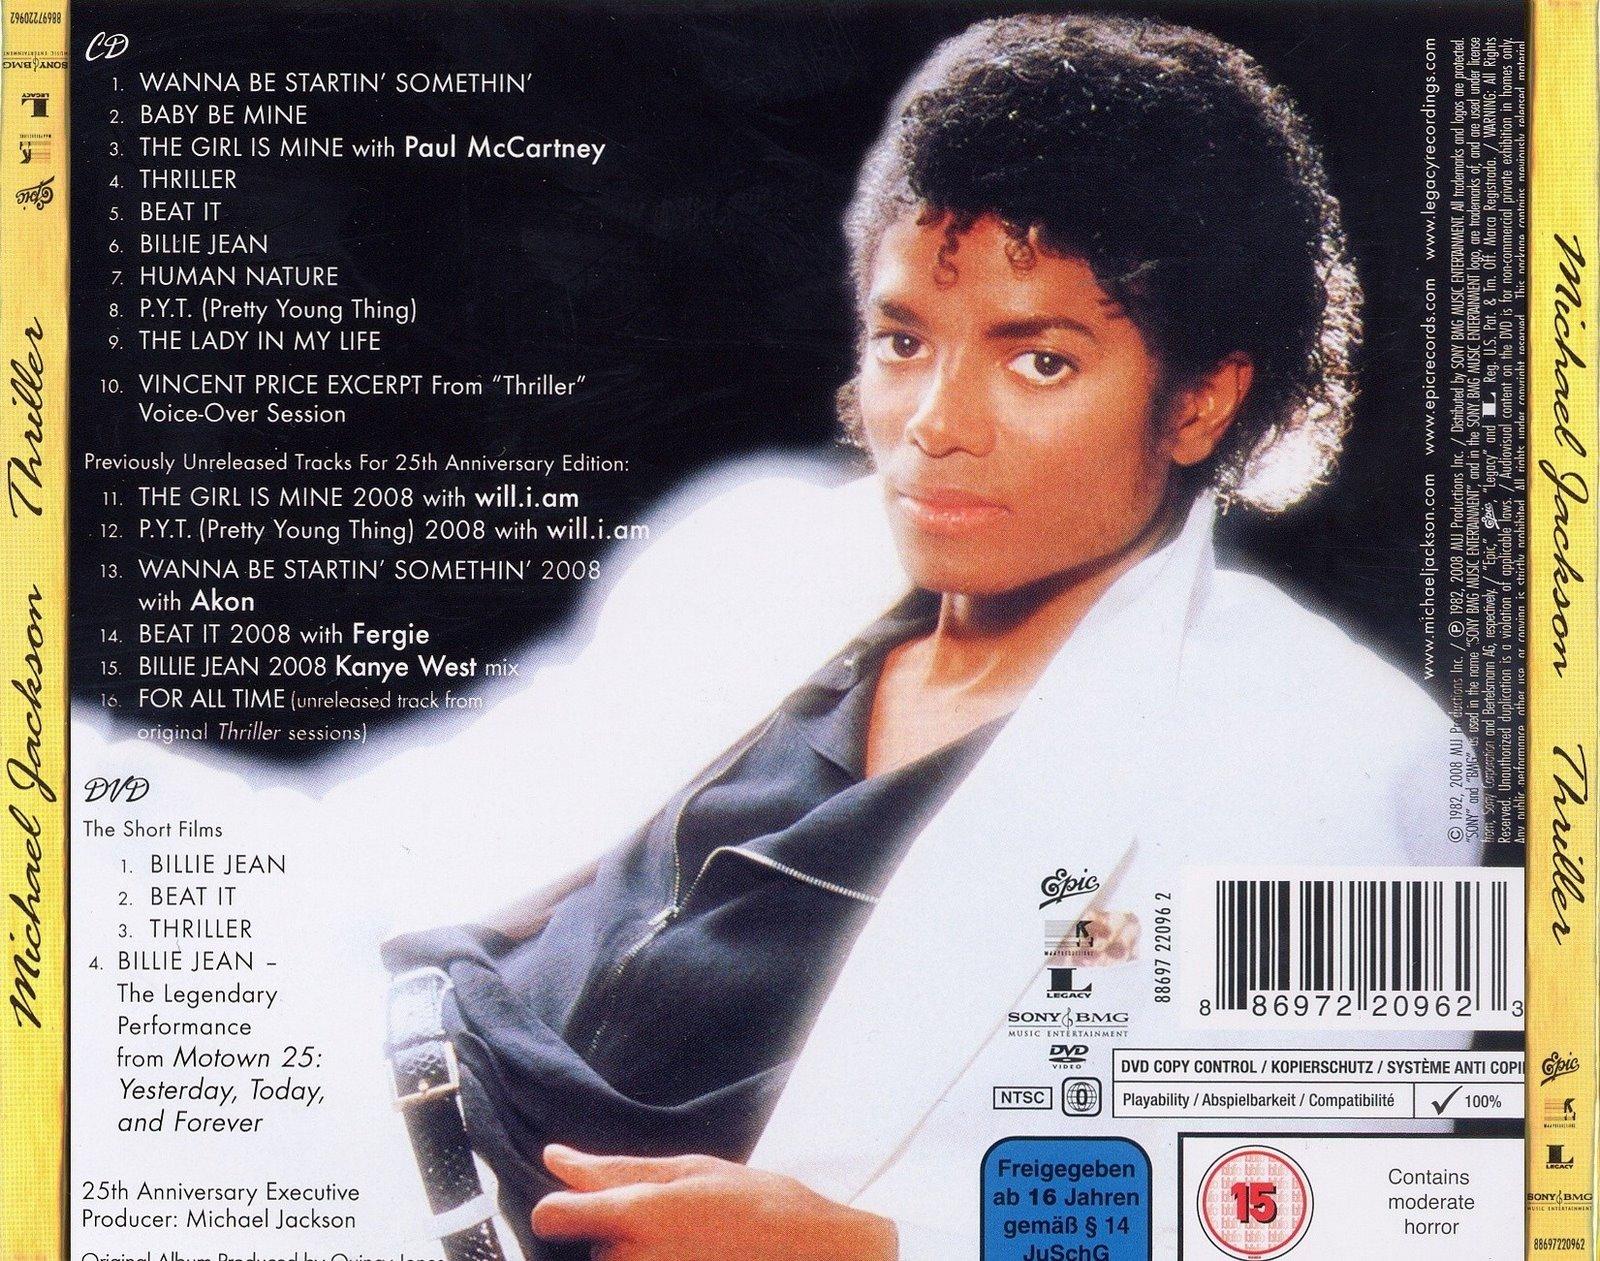 http://1.bp.blogspot.com/_q32YPlBd4mQ/S-eWGhaV3bI/AAAAAAAABLo/m0EKLepfHhI/s1600/00+Michael+J+2.jpg